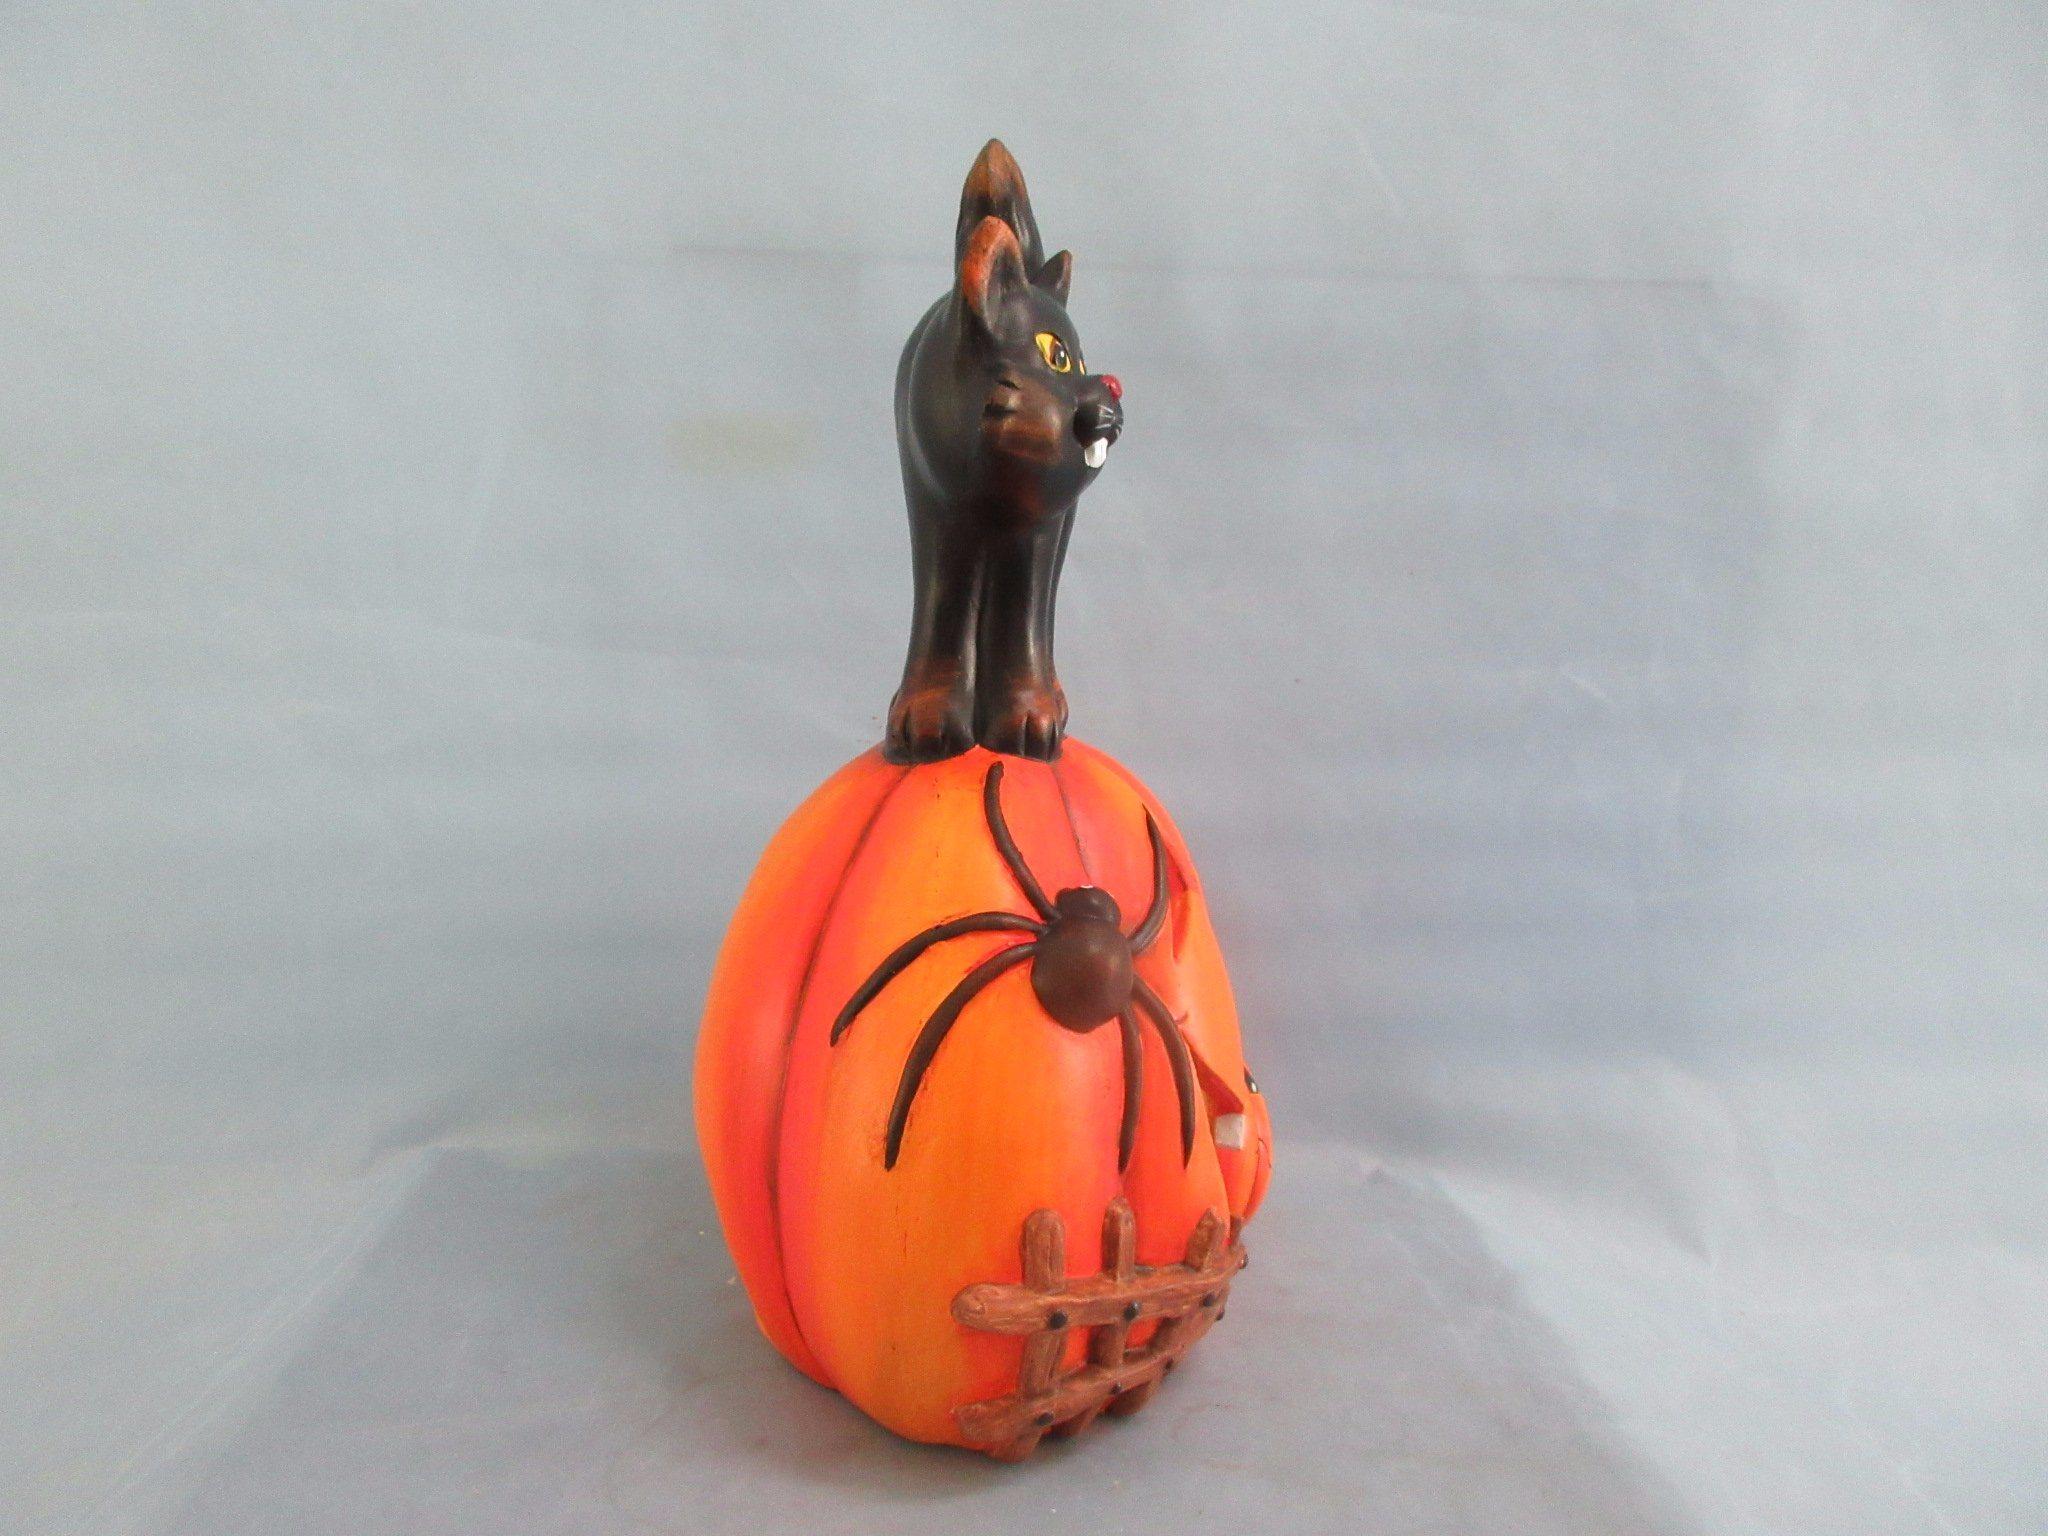 Halloween Pumpkin Ceramic Arts and Crafts (LOE2682-47z)